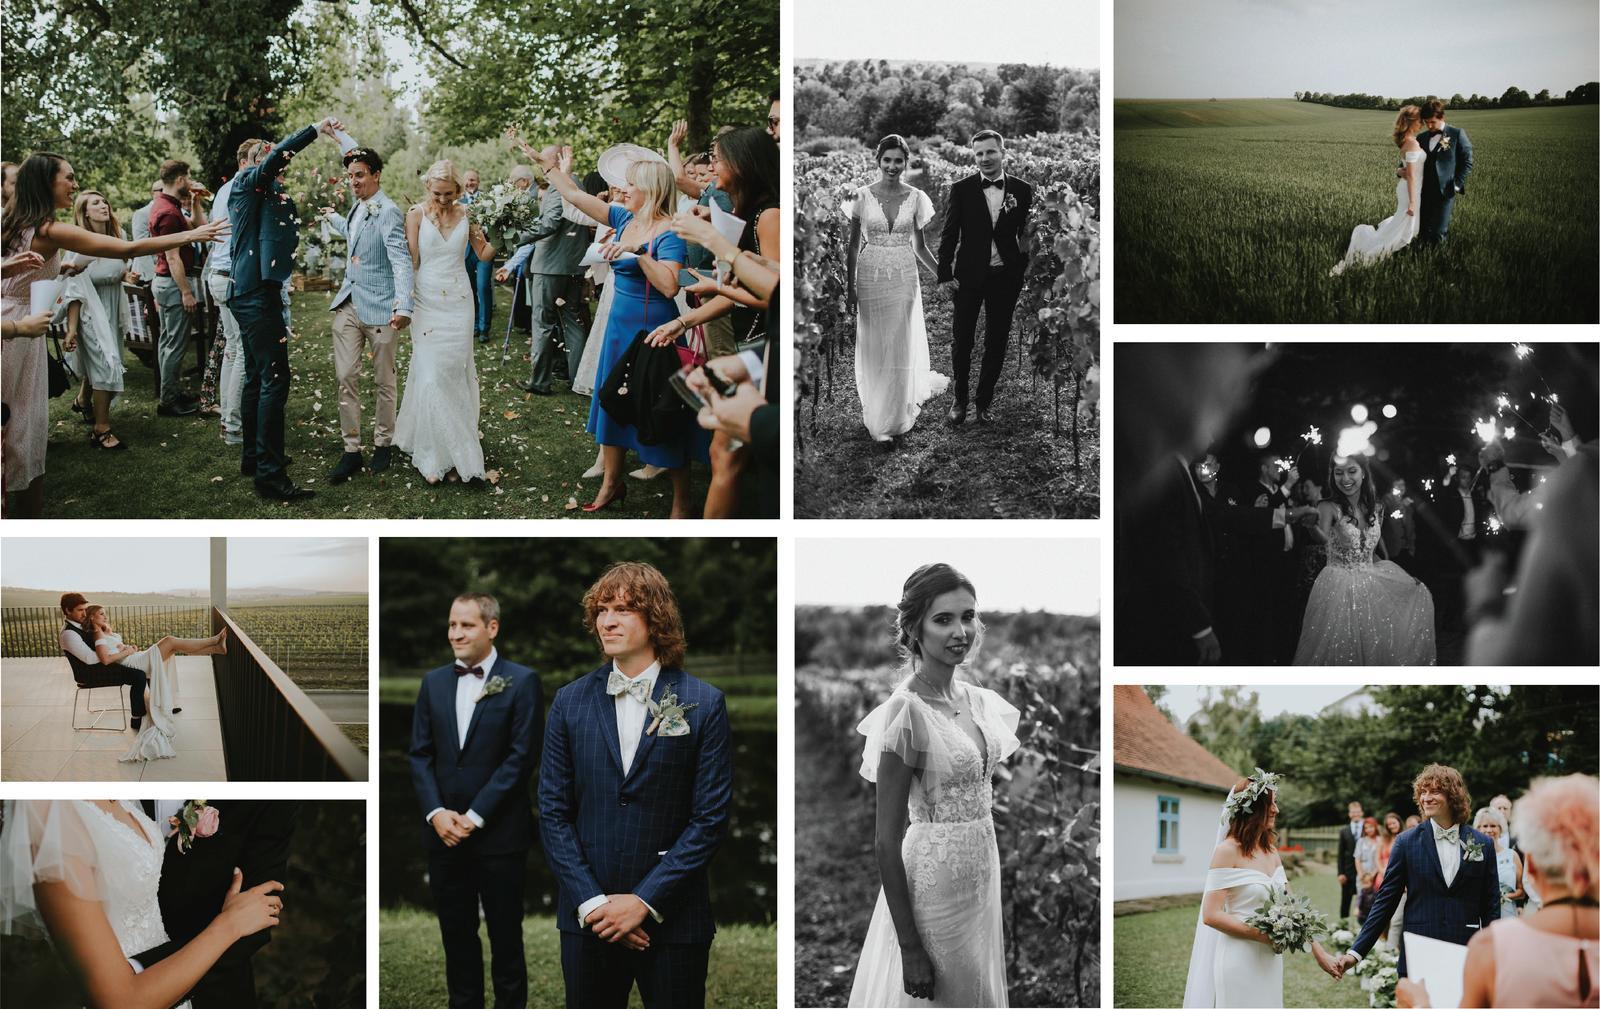 Moc ráda Vám svatbu... - Obrázek č. 1